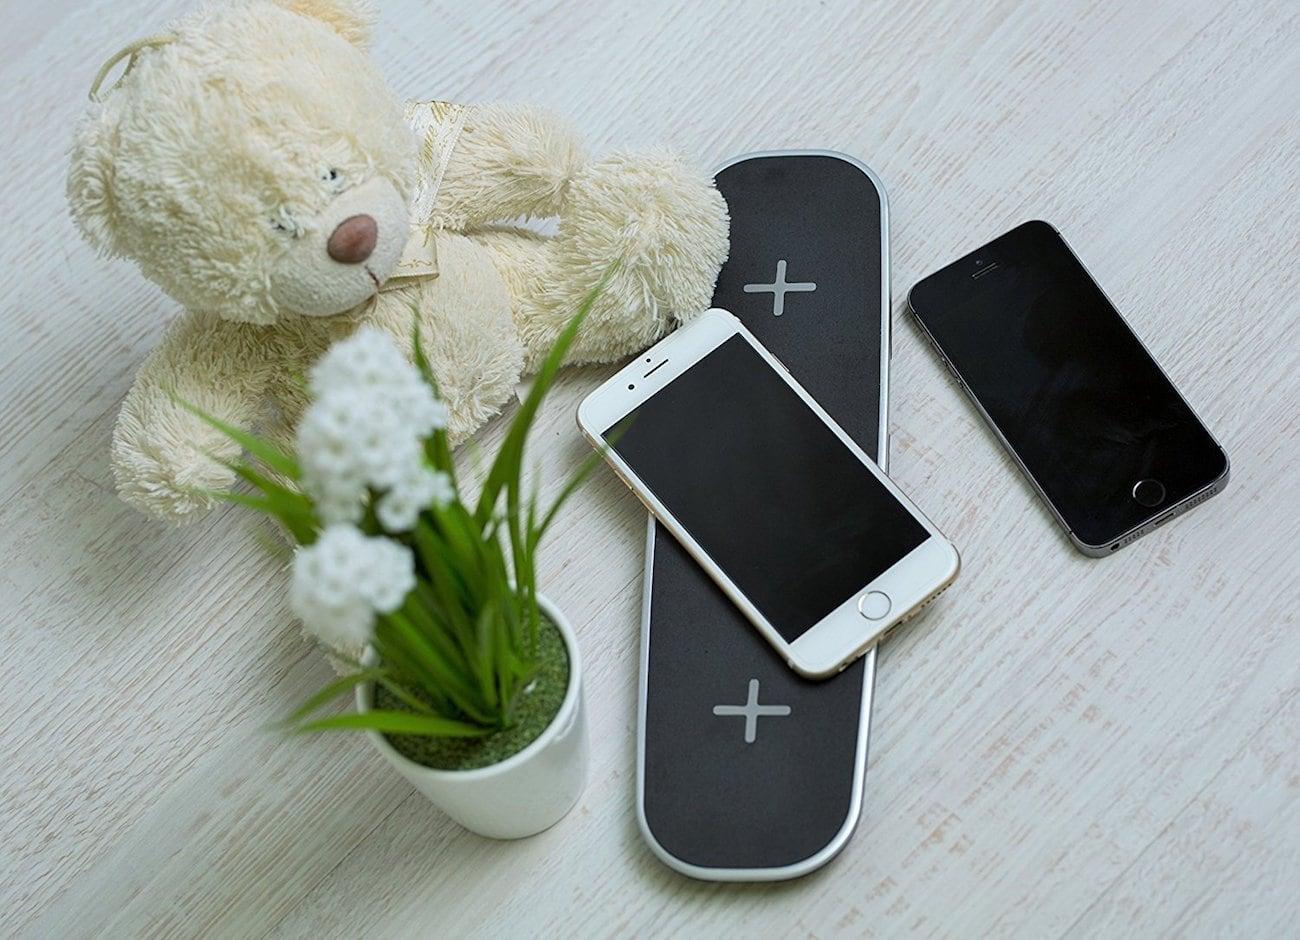 YTech Triple Fast Wireless Charging Pad